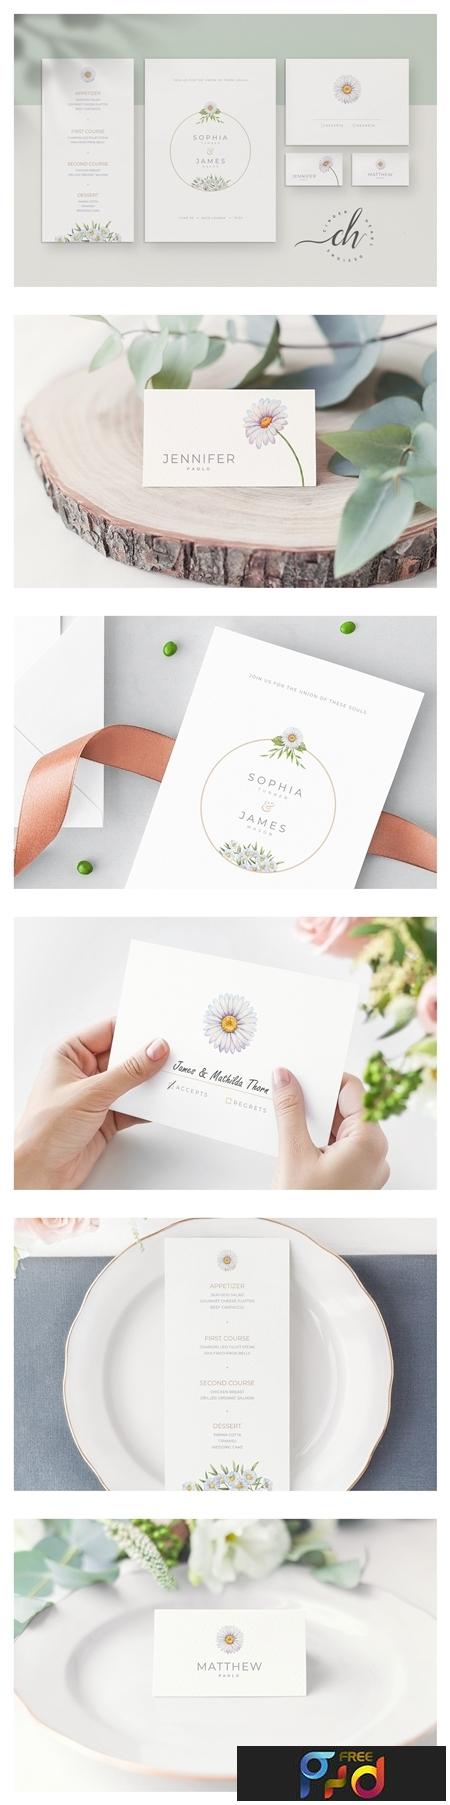 Opal Wedding Invitation Suite 3278930 1